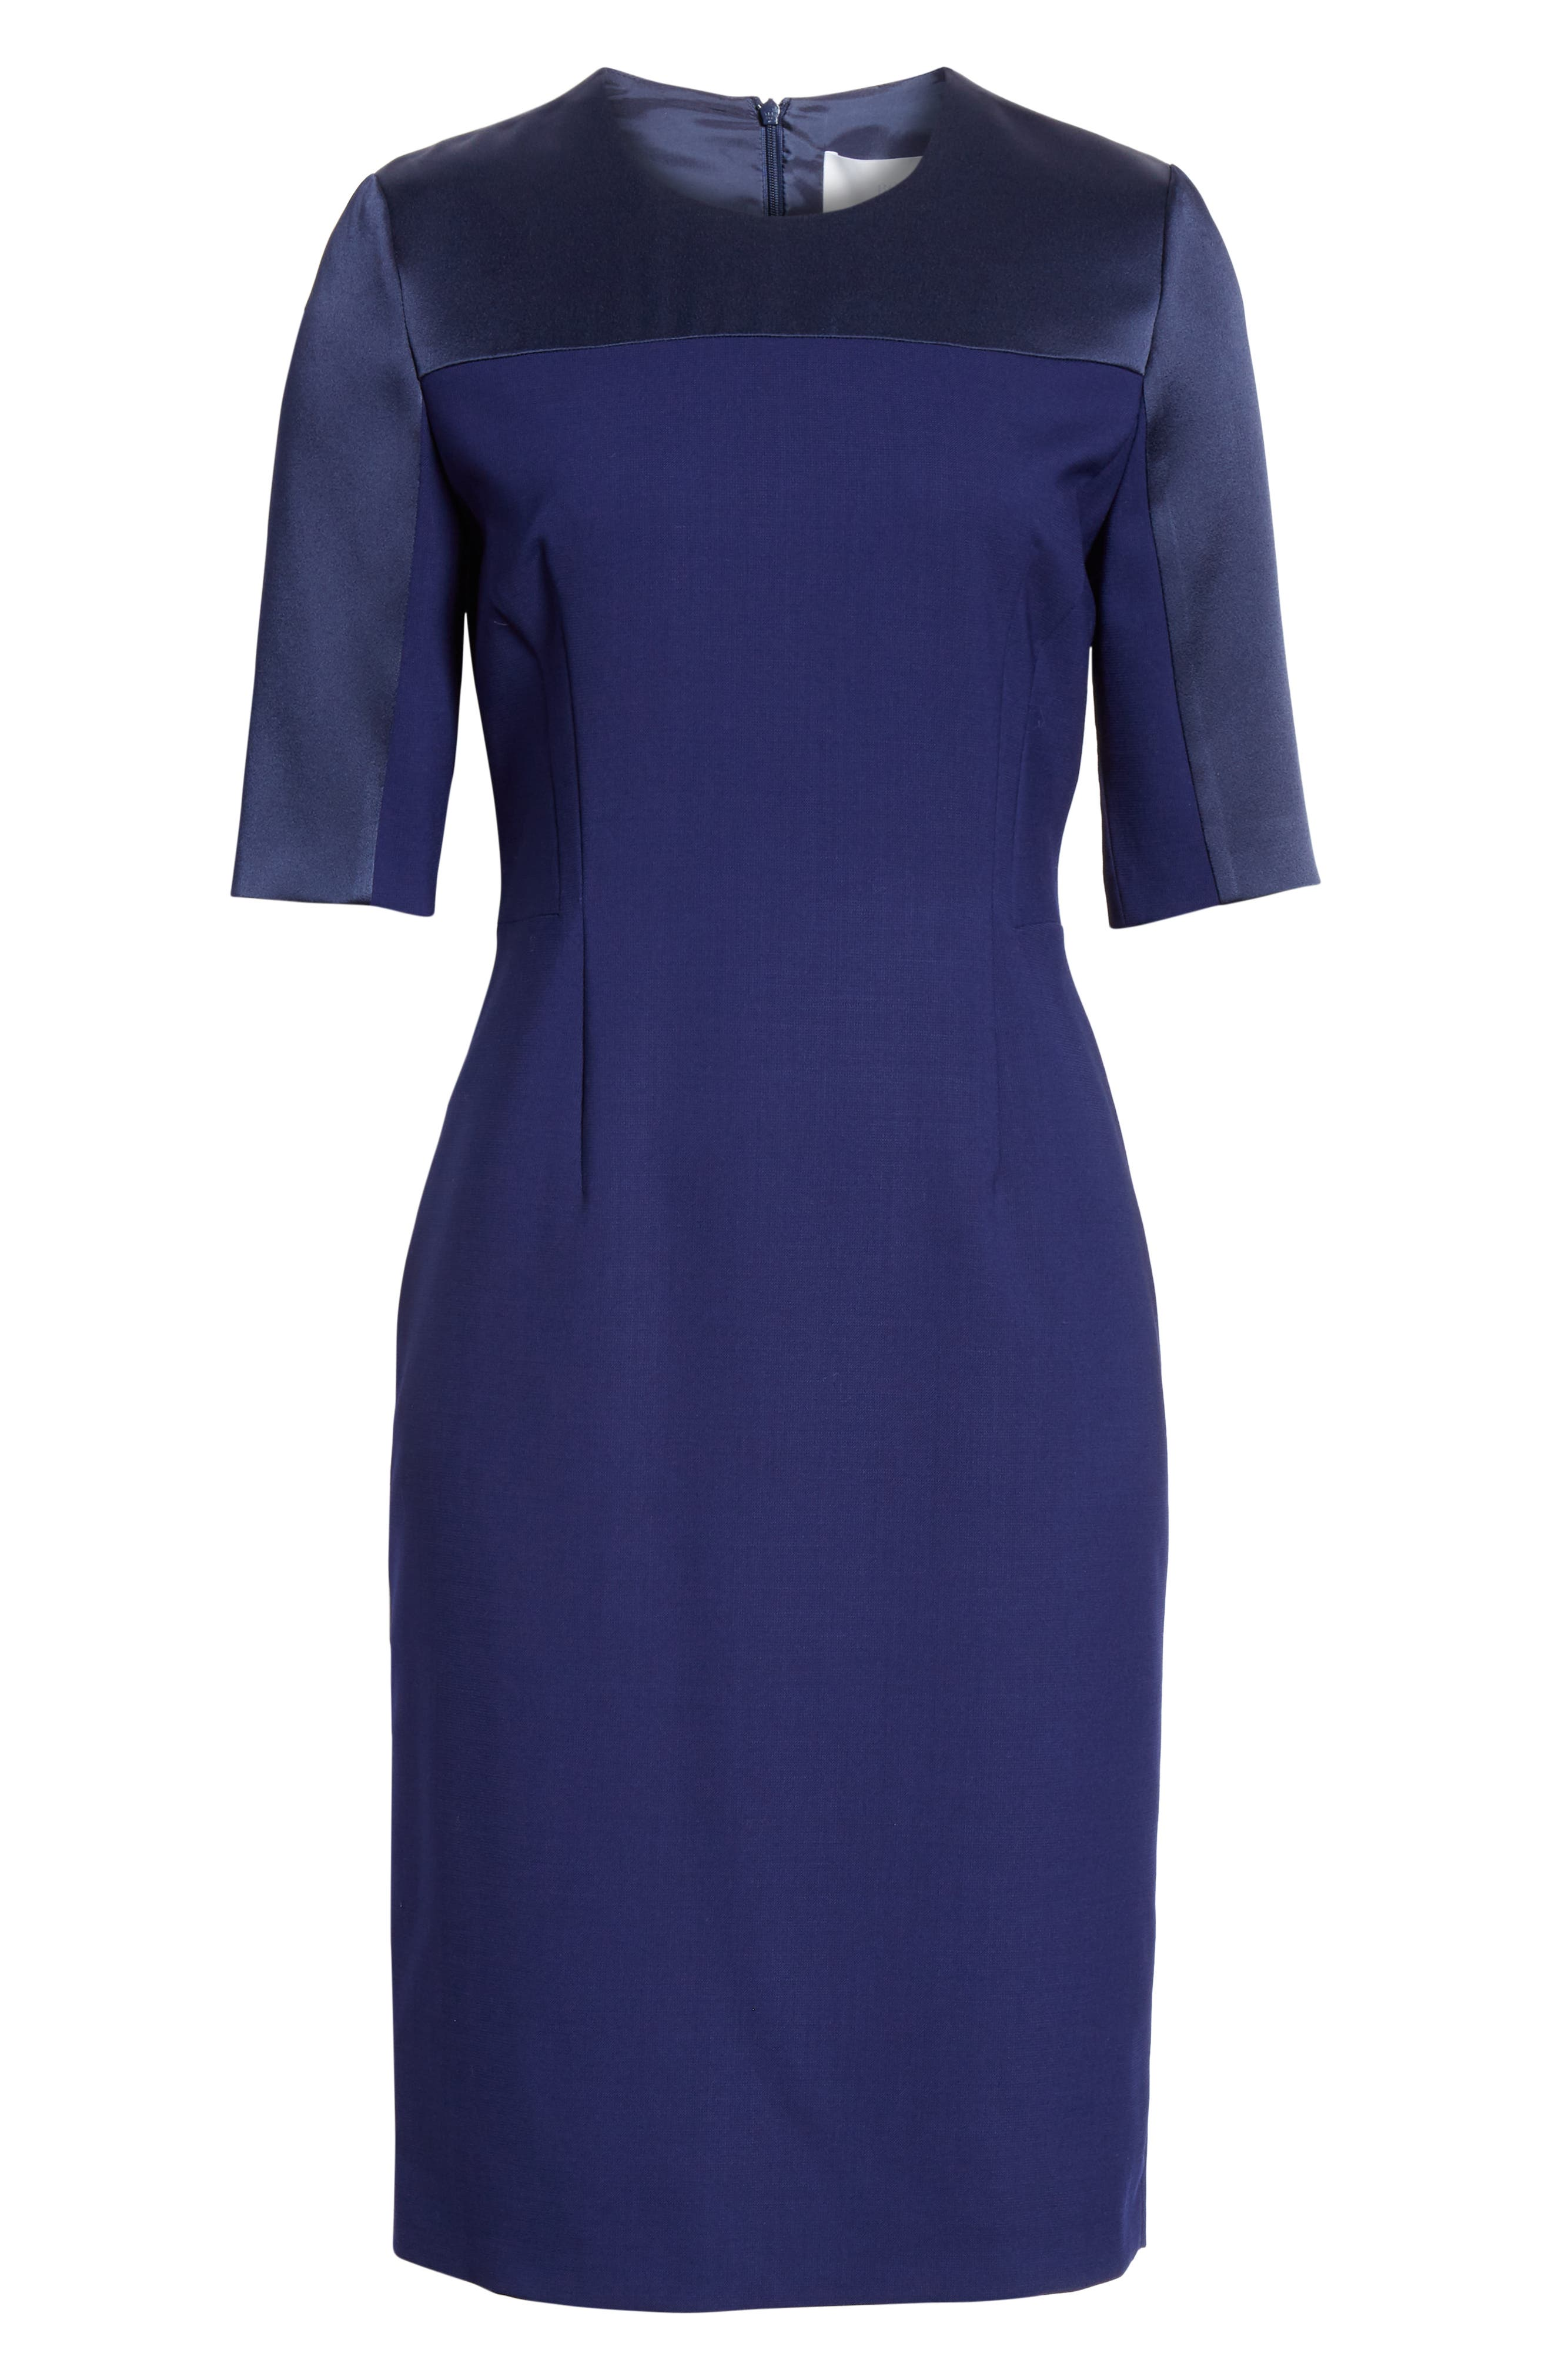 Danufa Stretch Wool Sheath Dress,                             Alternate thumbnail 7, color,                             INK BLUE